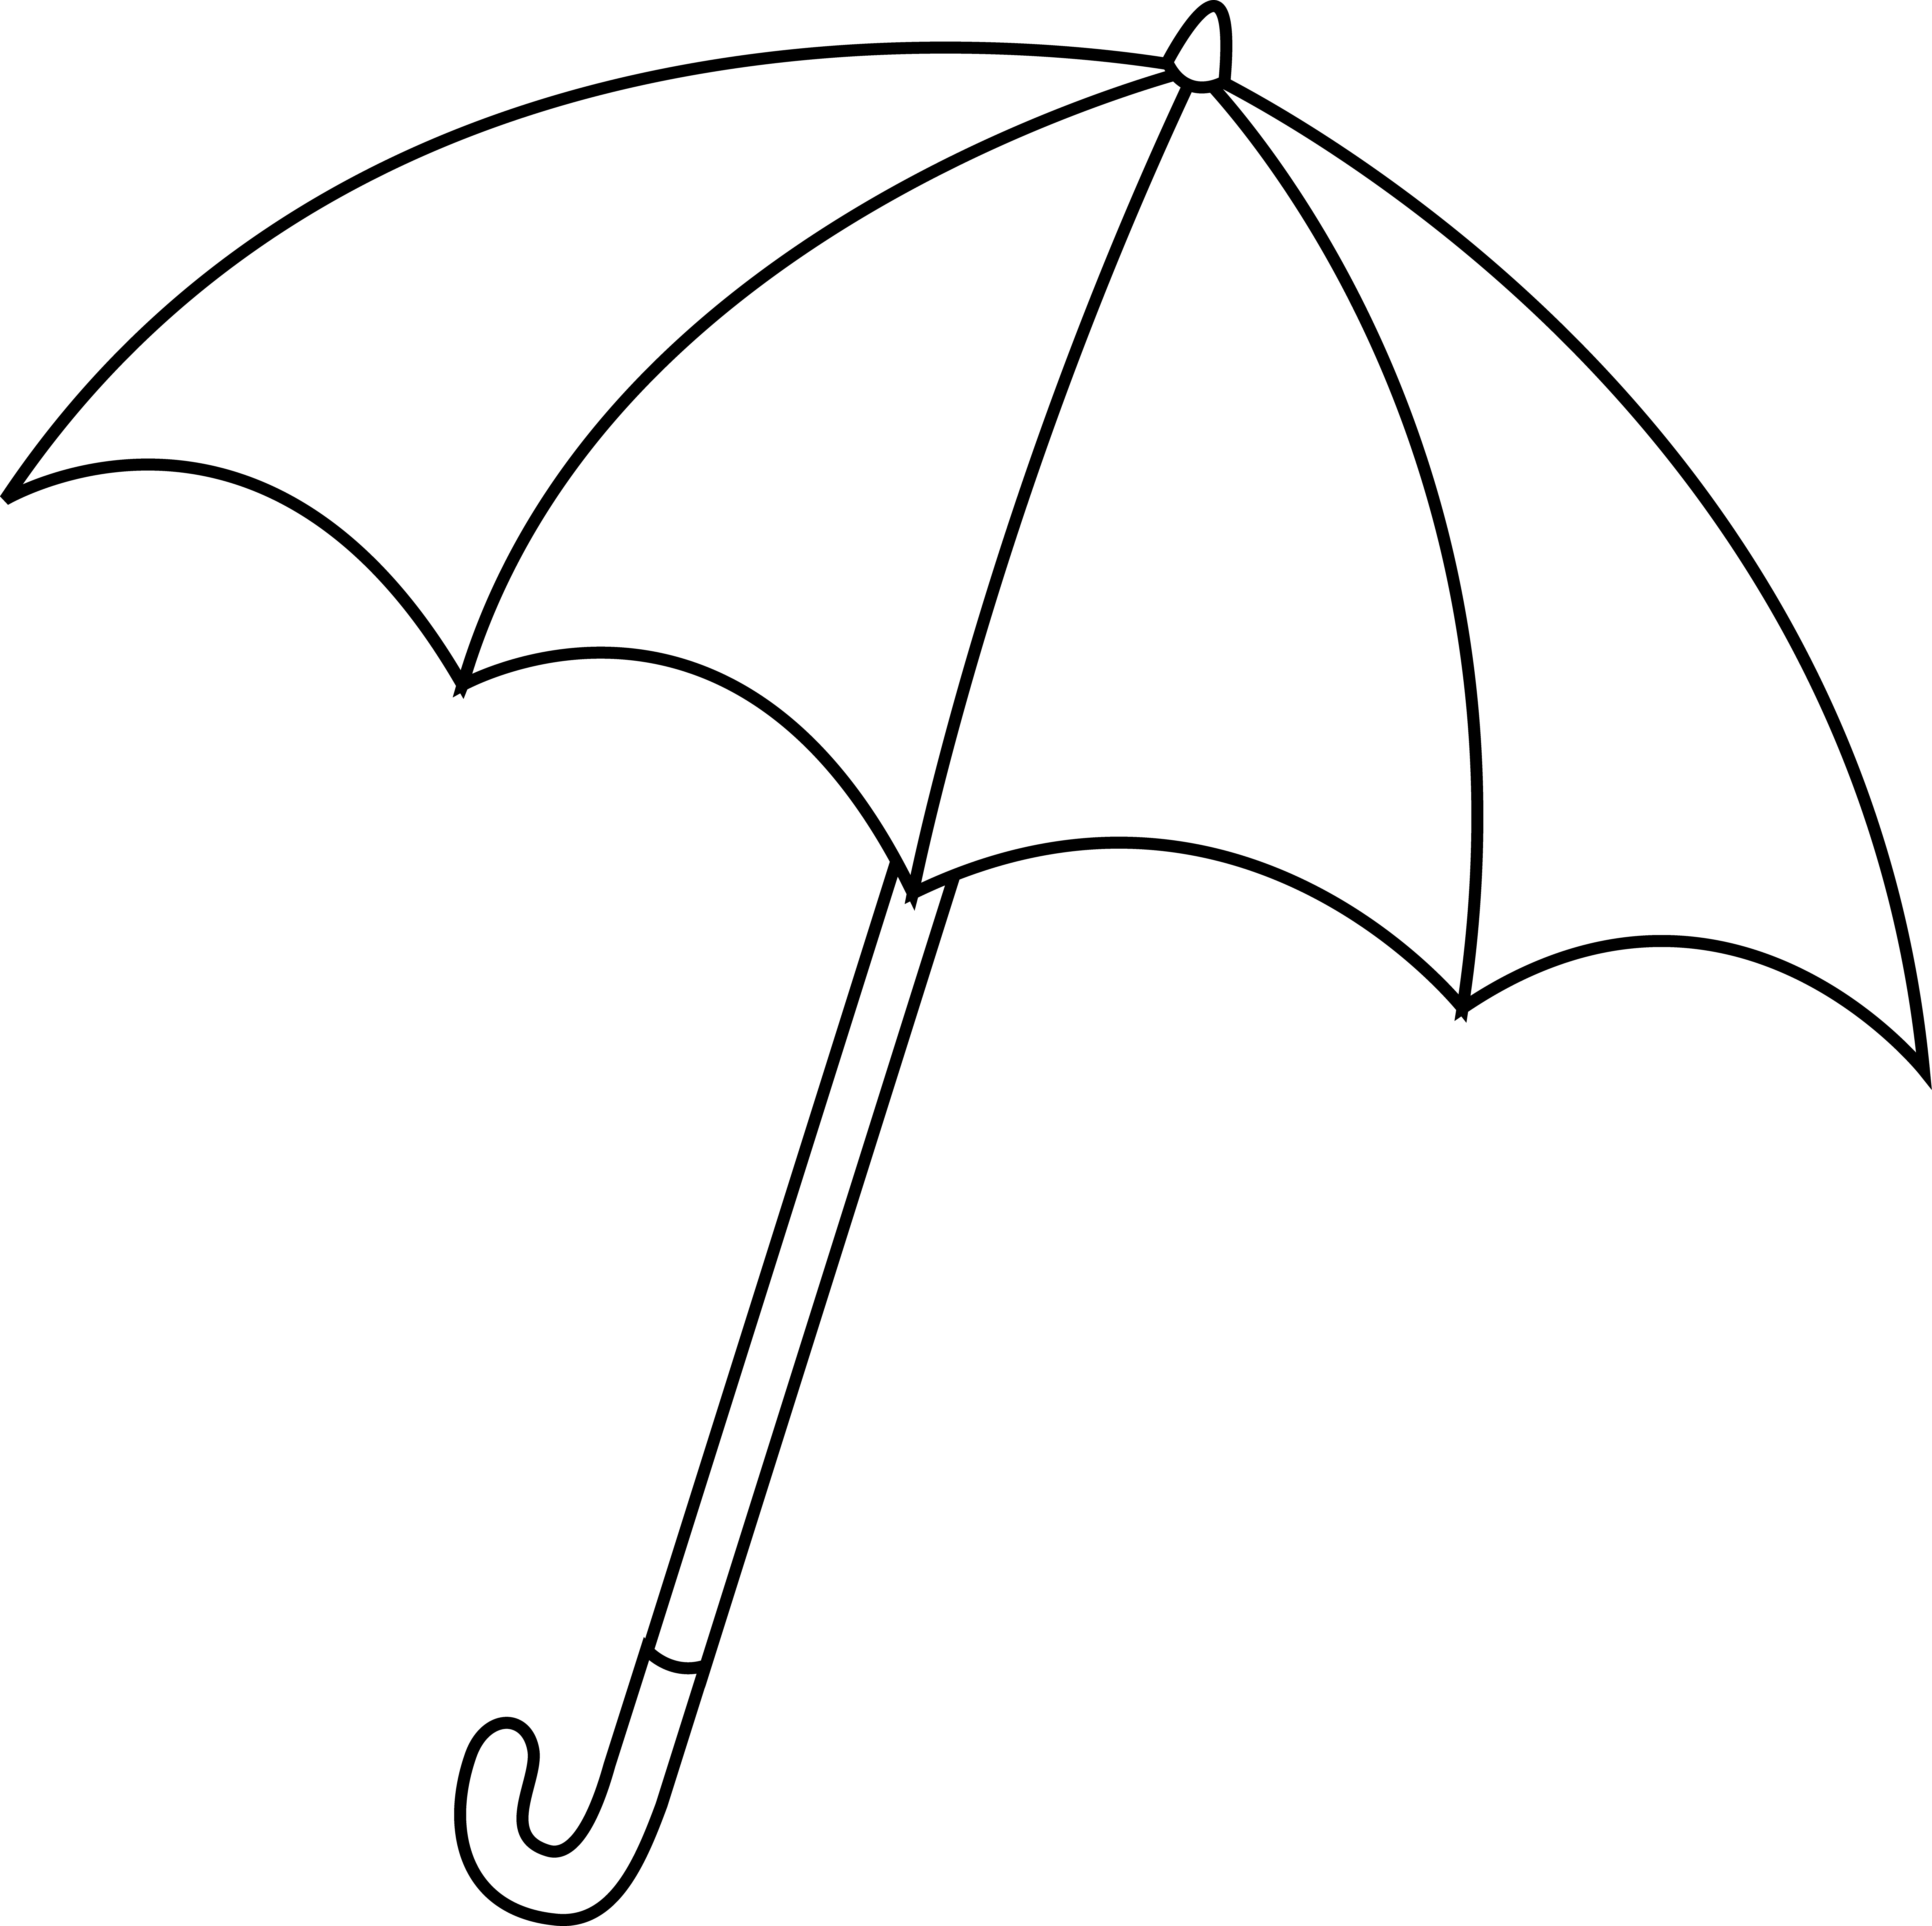 970fc989d3 Umbrella Clipart Black And White | Free download best Umbrella ...